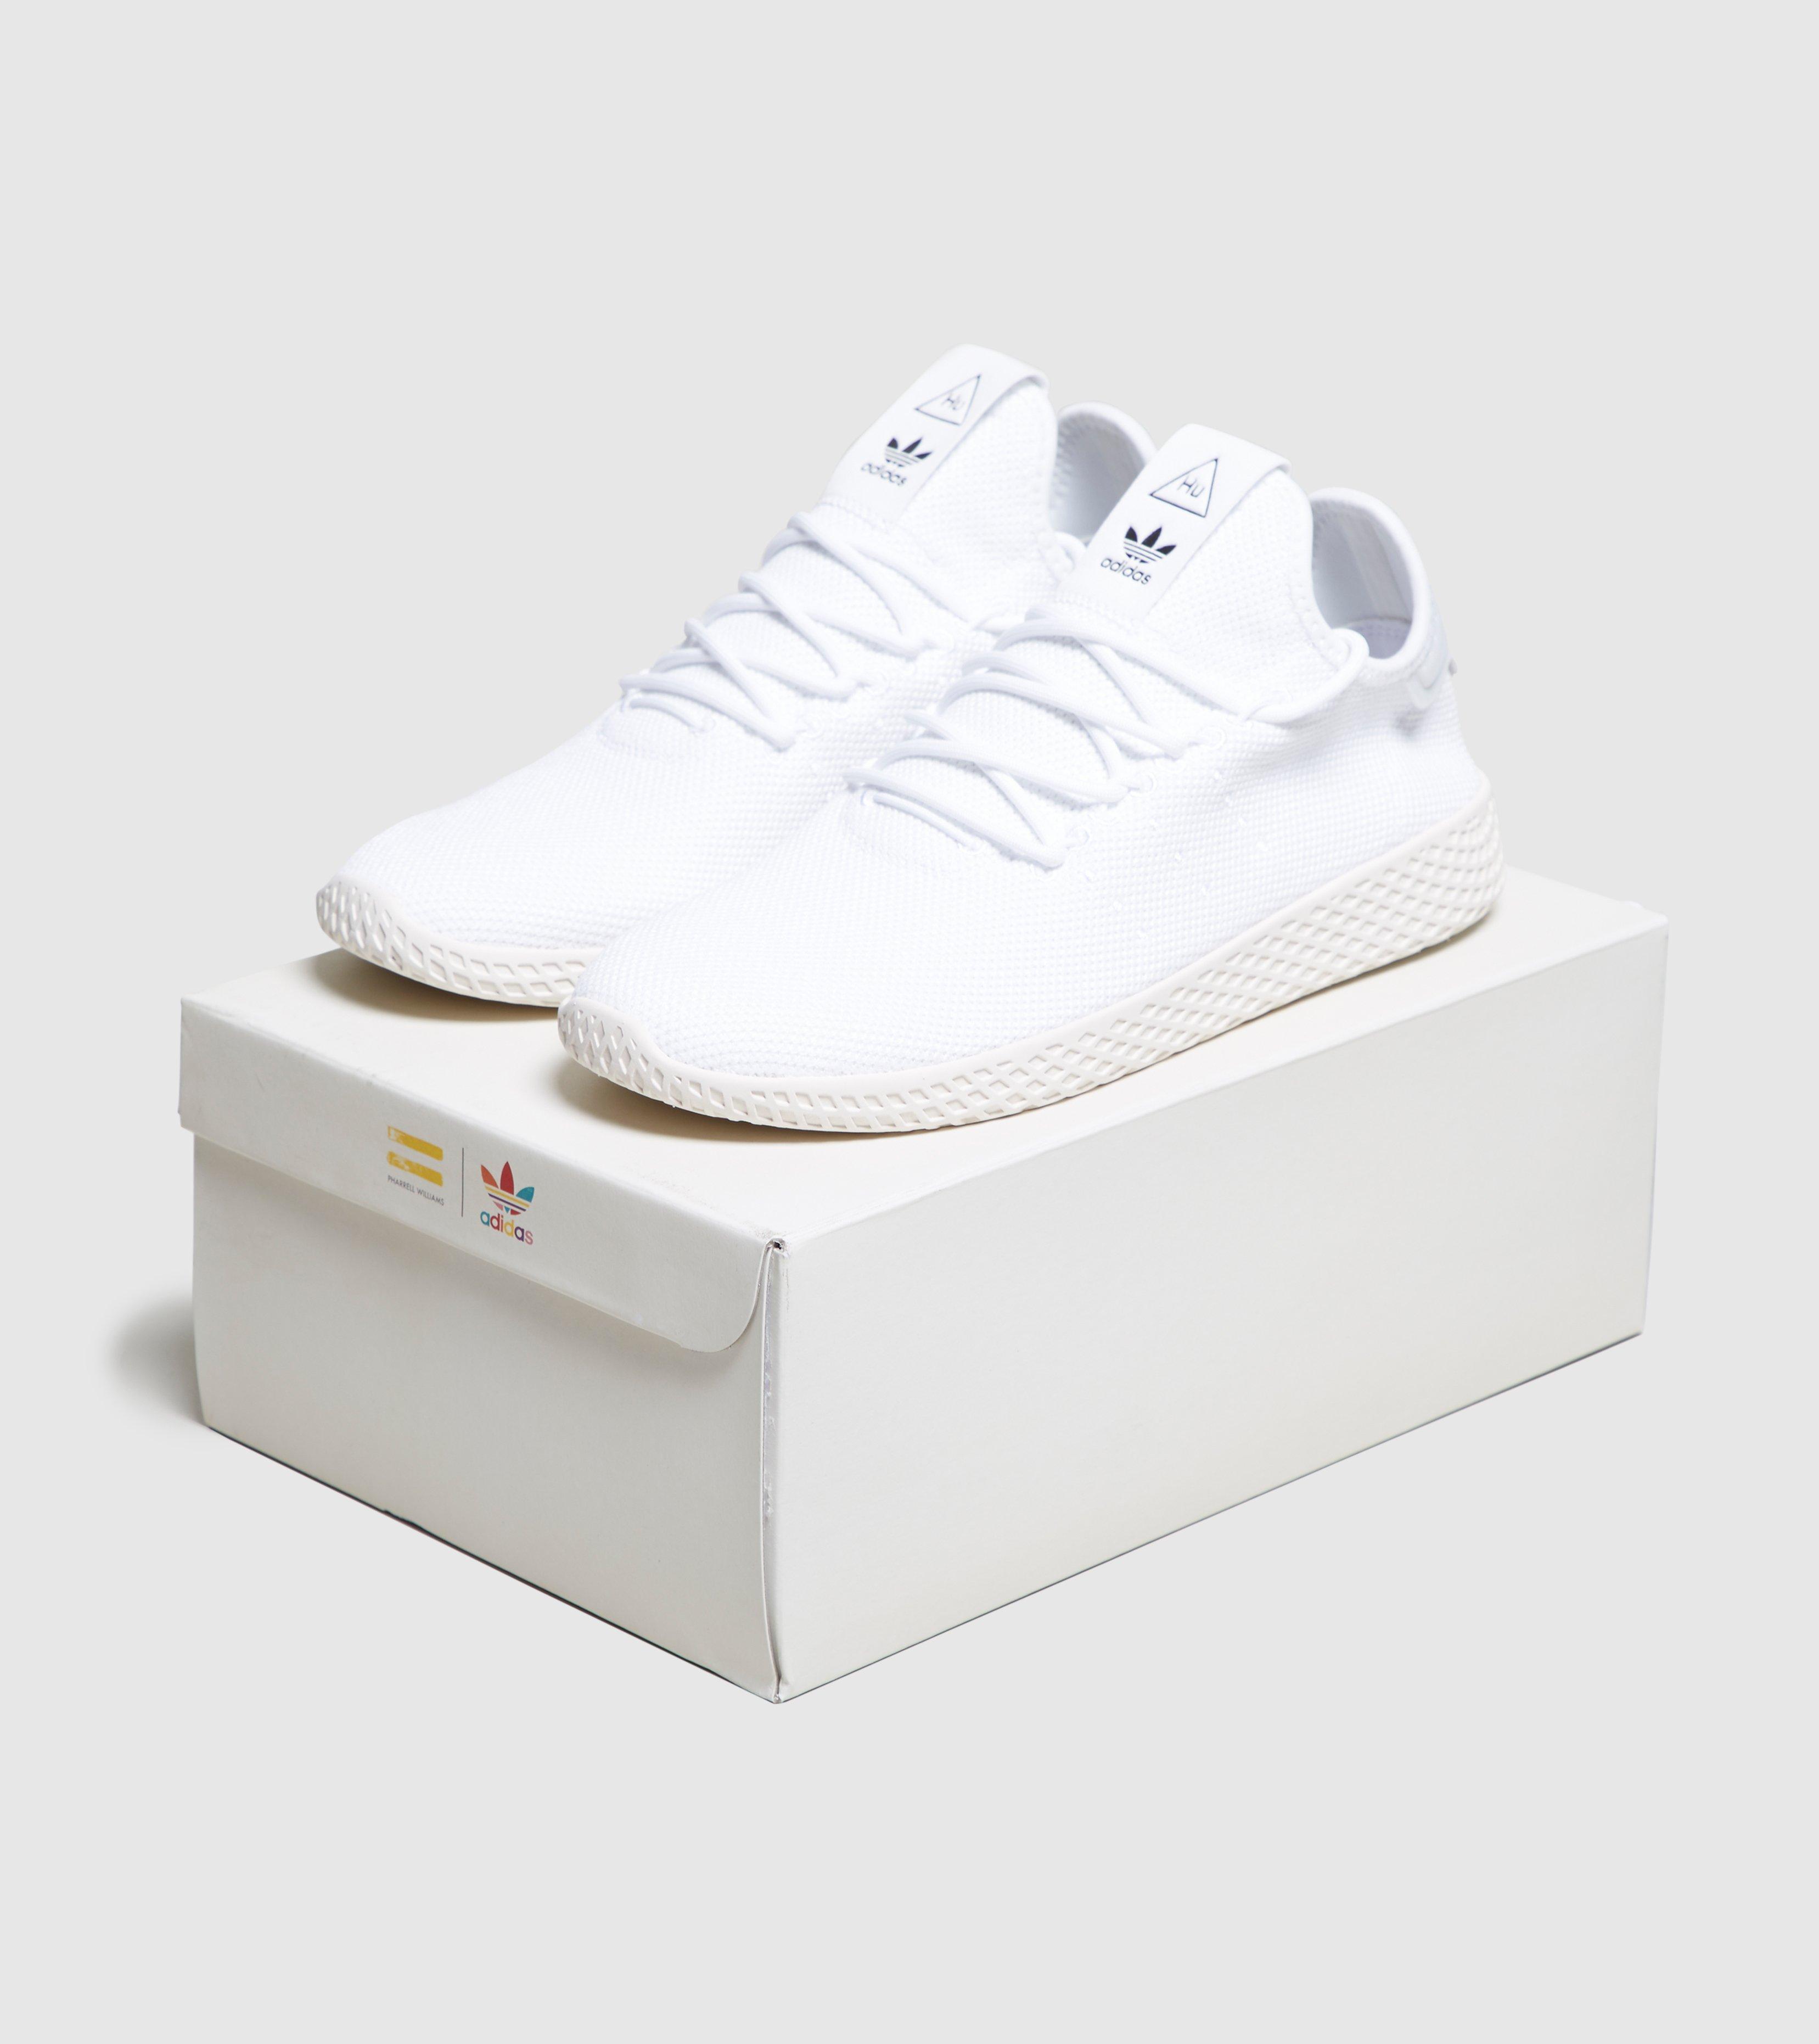 d2154c1a94889 adidas originals pharrell williams tennis hu jusqu à 60% www.citroen ...